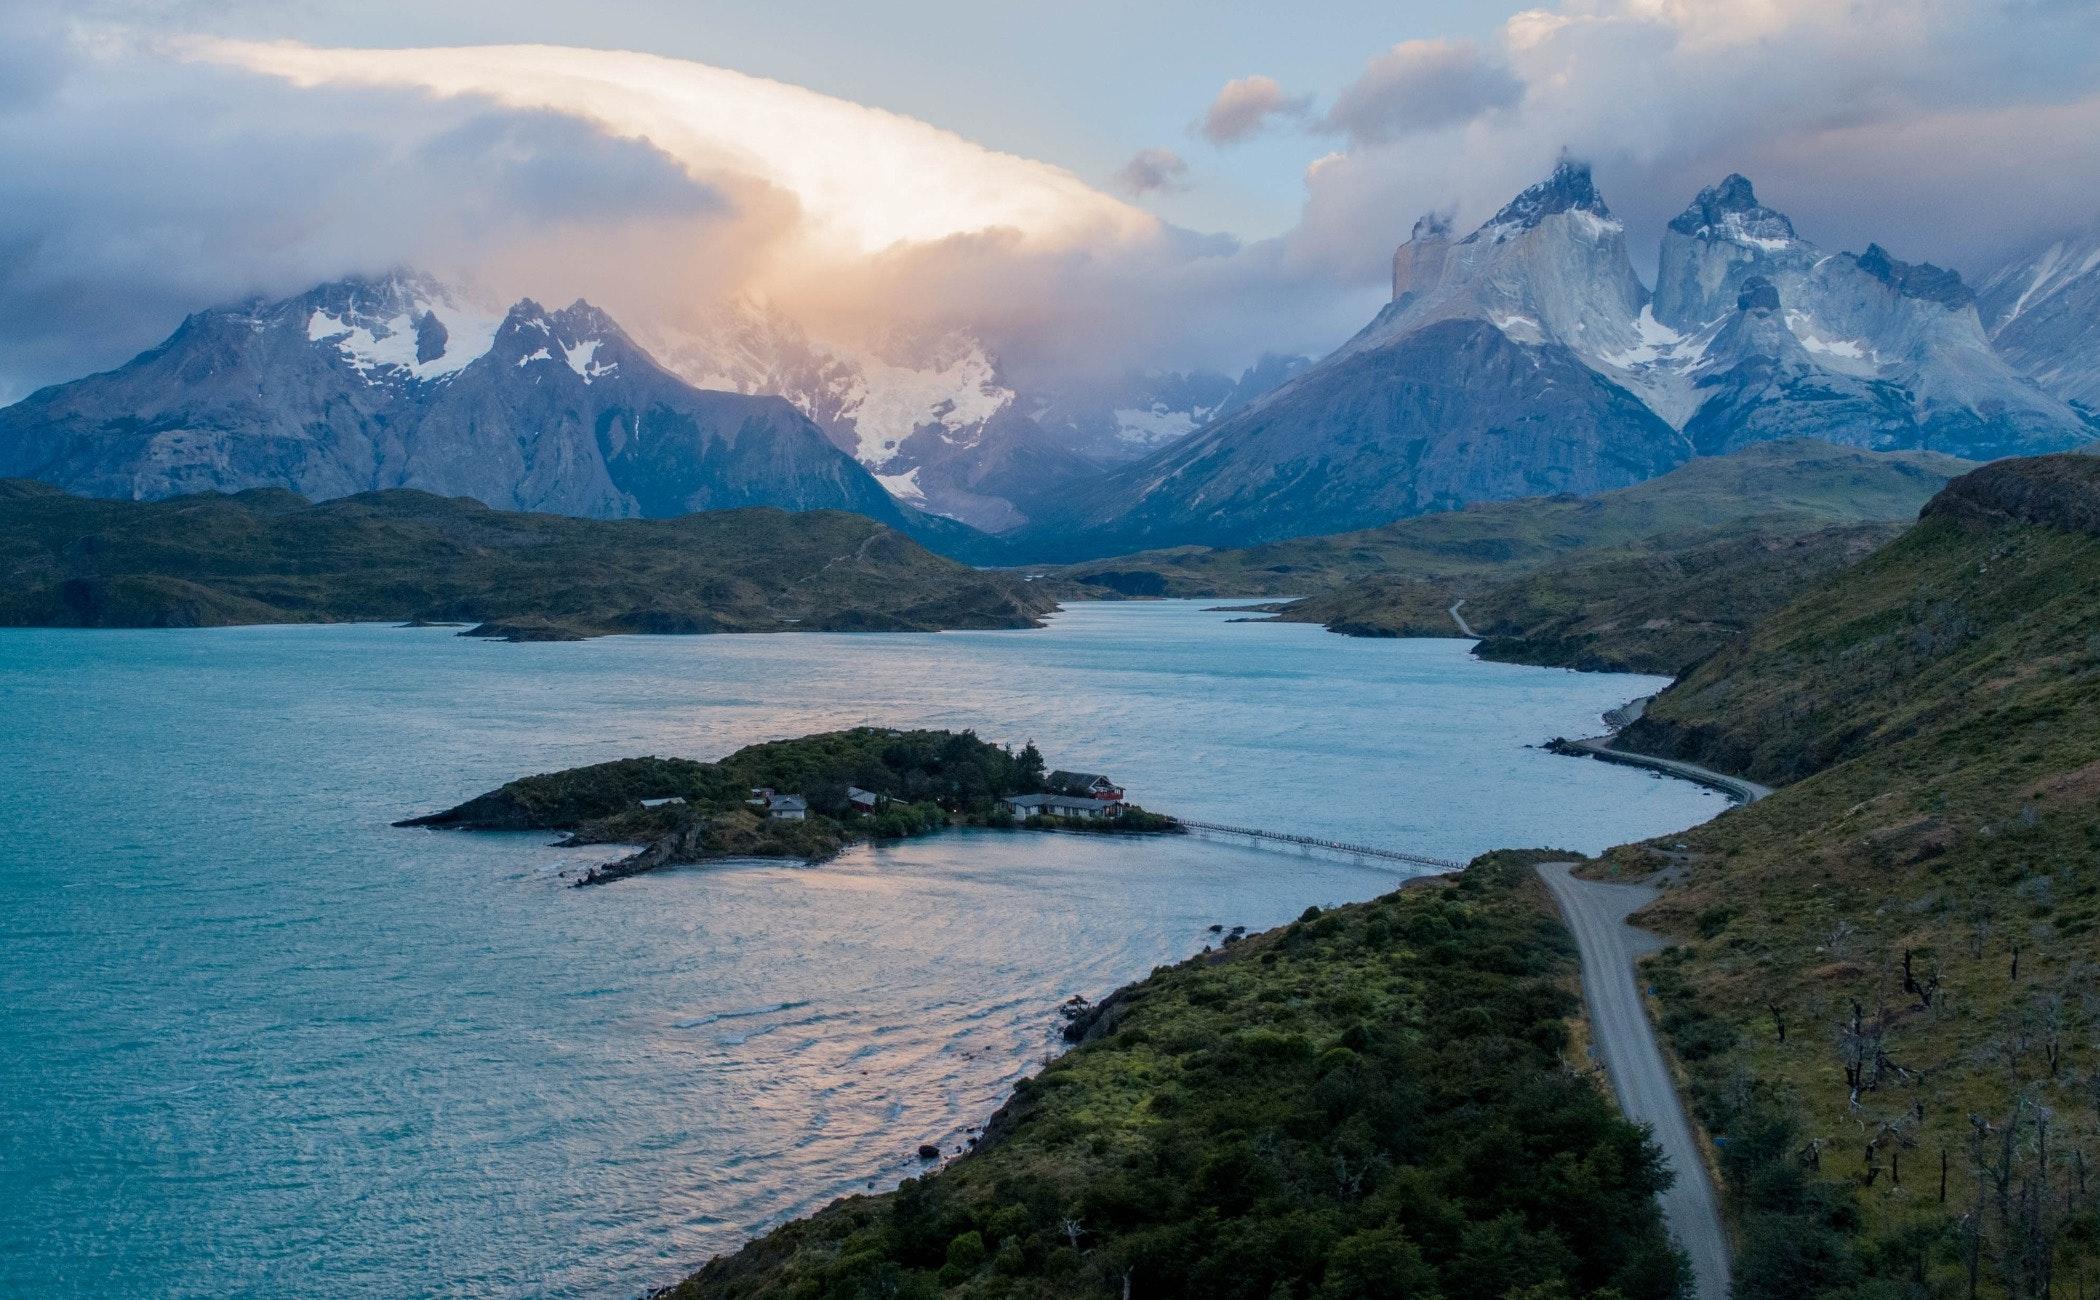 nature,outdoors,land,mountain,shoreline,water,sea,mountain range,ice,promontory